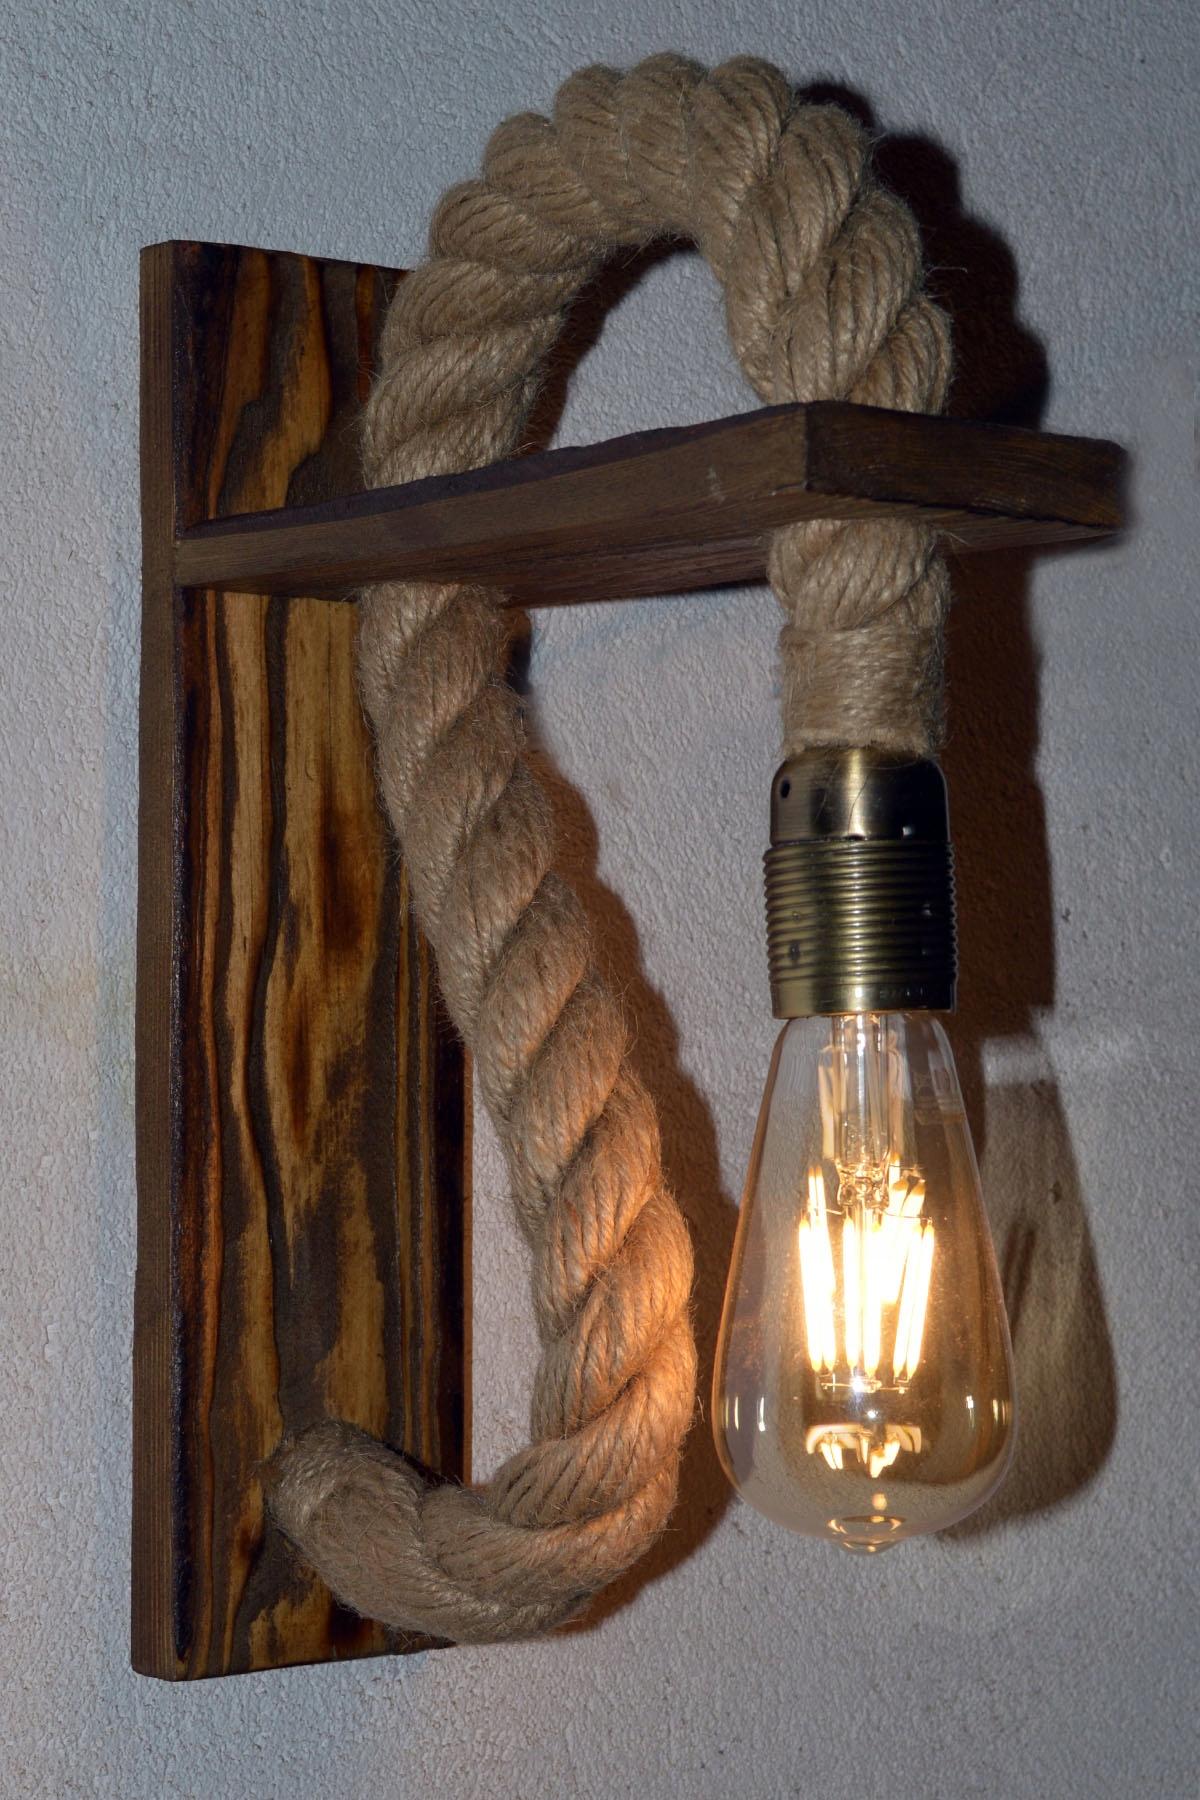 Drevené nástenné svietidlo kábel jutowy VINTAGE štýle RETRO